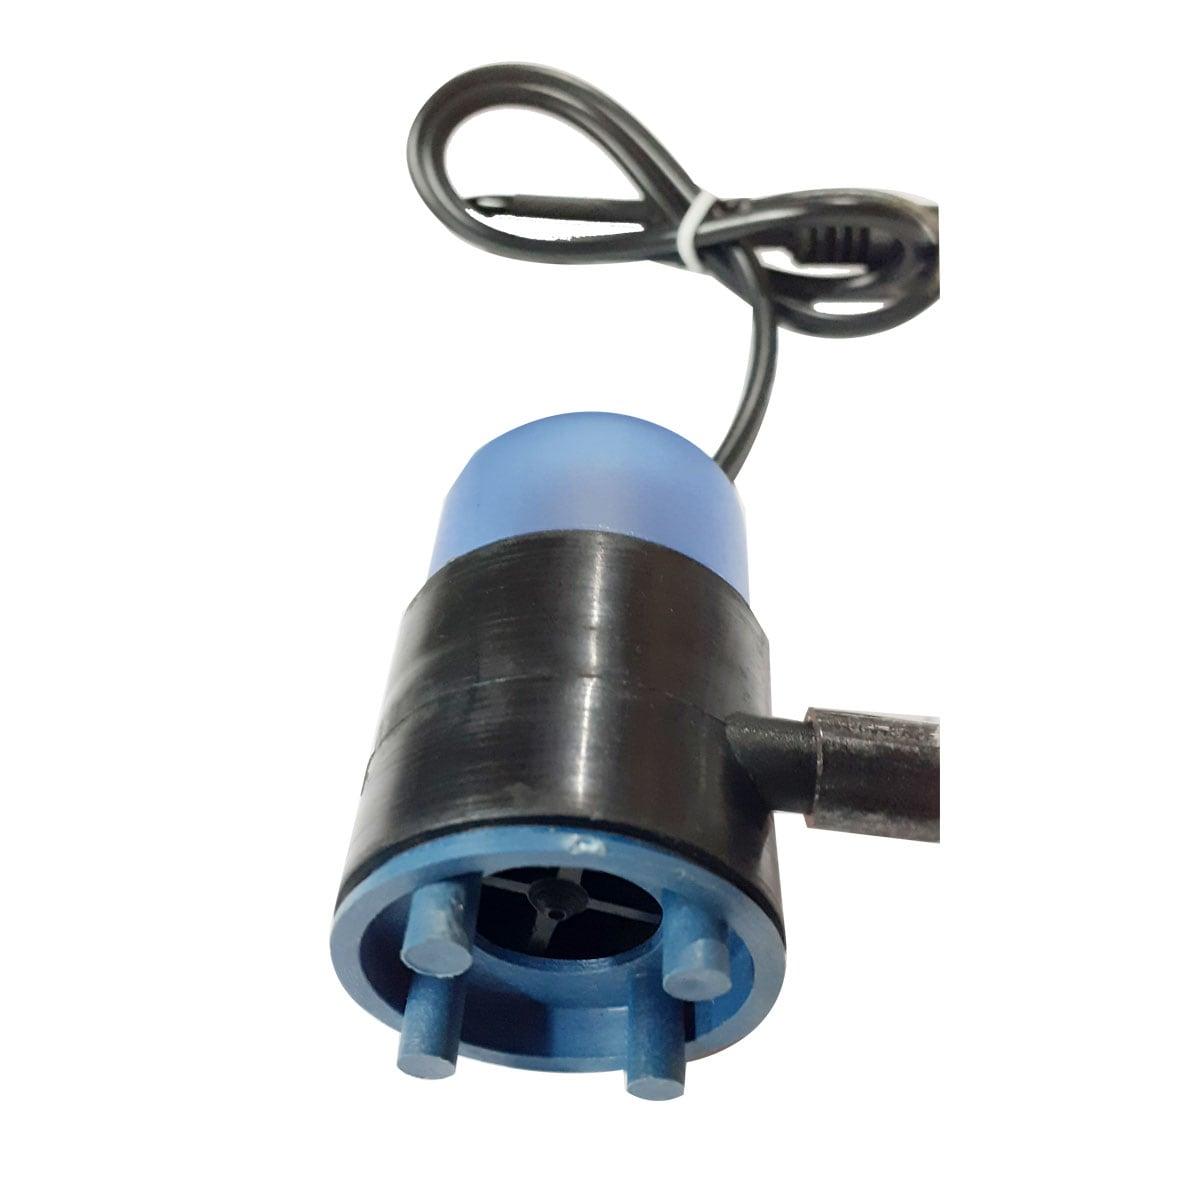 MT-35- Submersible High Pressure Water Pump (DC 6V) / MOTORS & GENERATORS